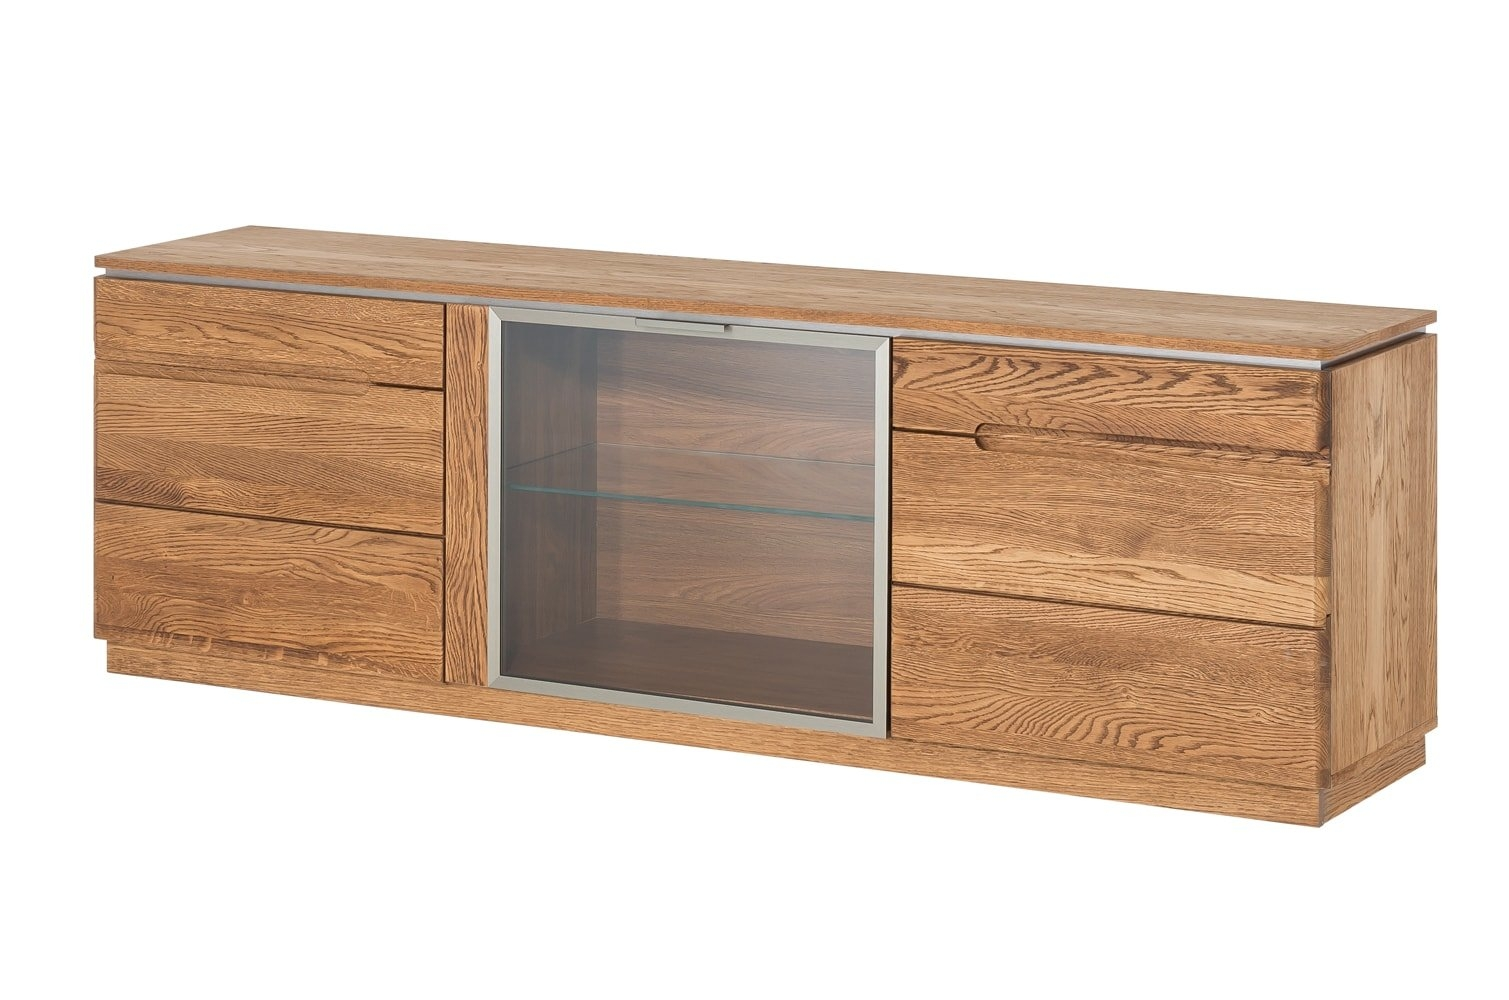 Comoda TV din lemn si furnir, cu 3 usi Montenegro 26 Large Stejar Rustic, l180xA42xH59 cm vivre.ro